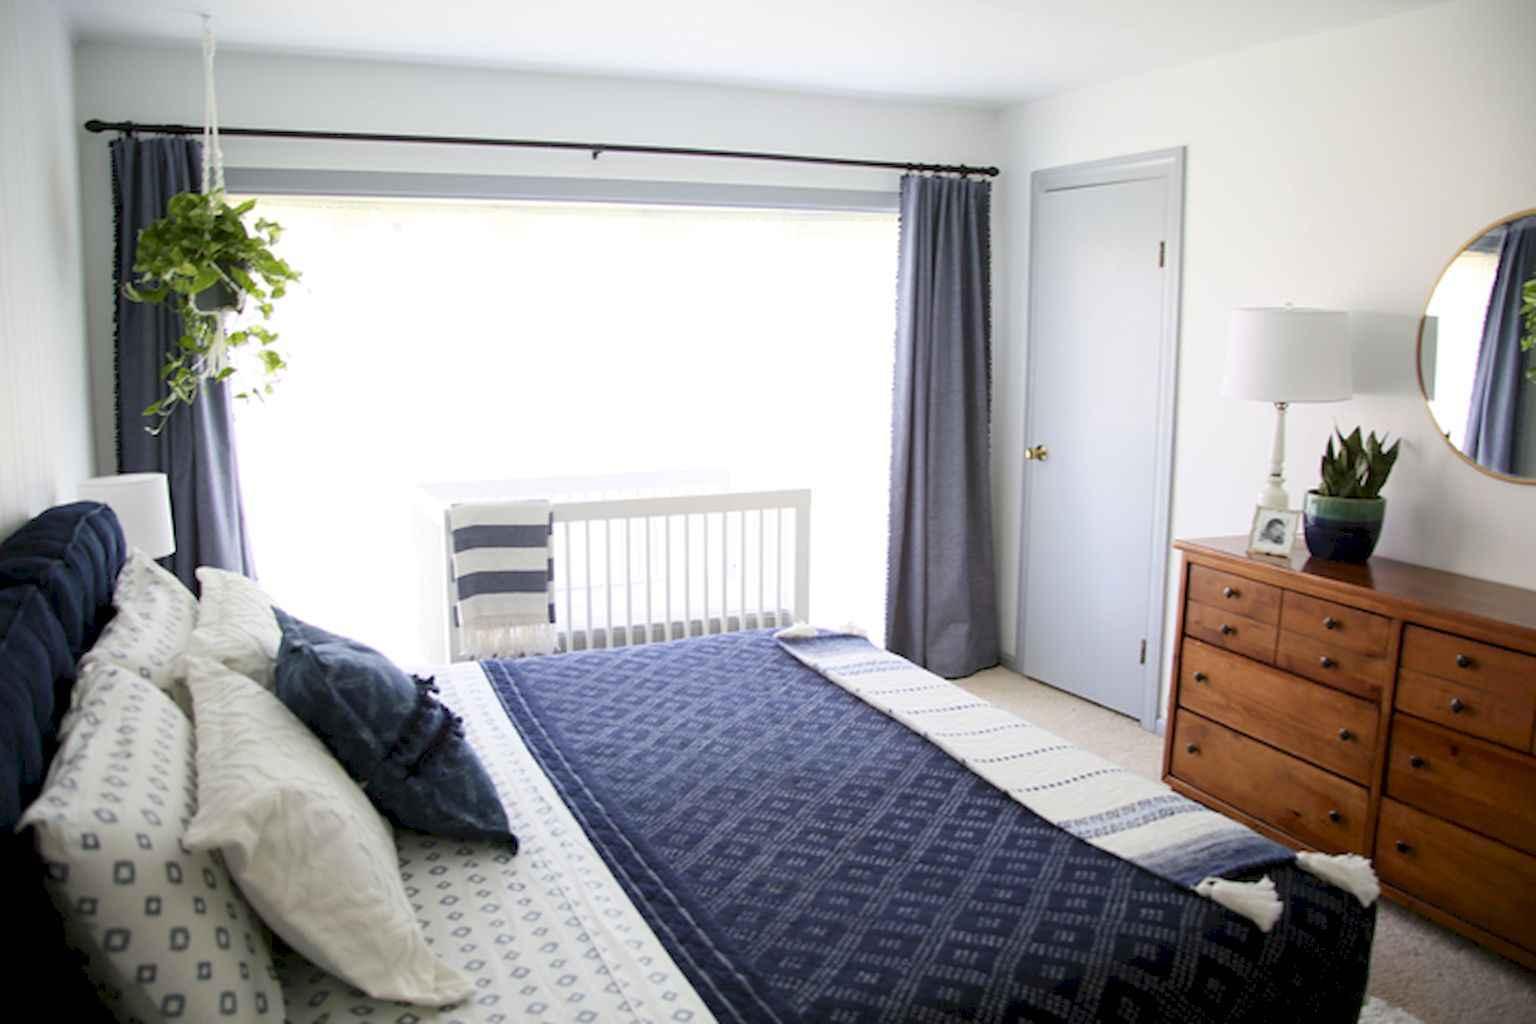 100 Stunning Farmhouse Master Bedroom Decor Ideas (17)